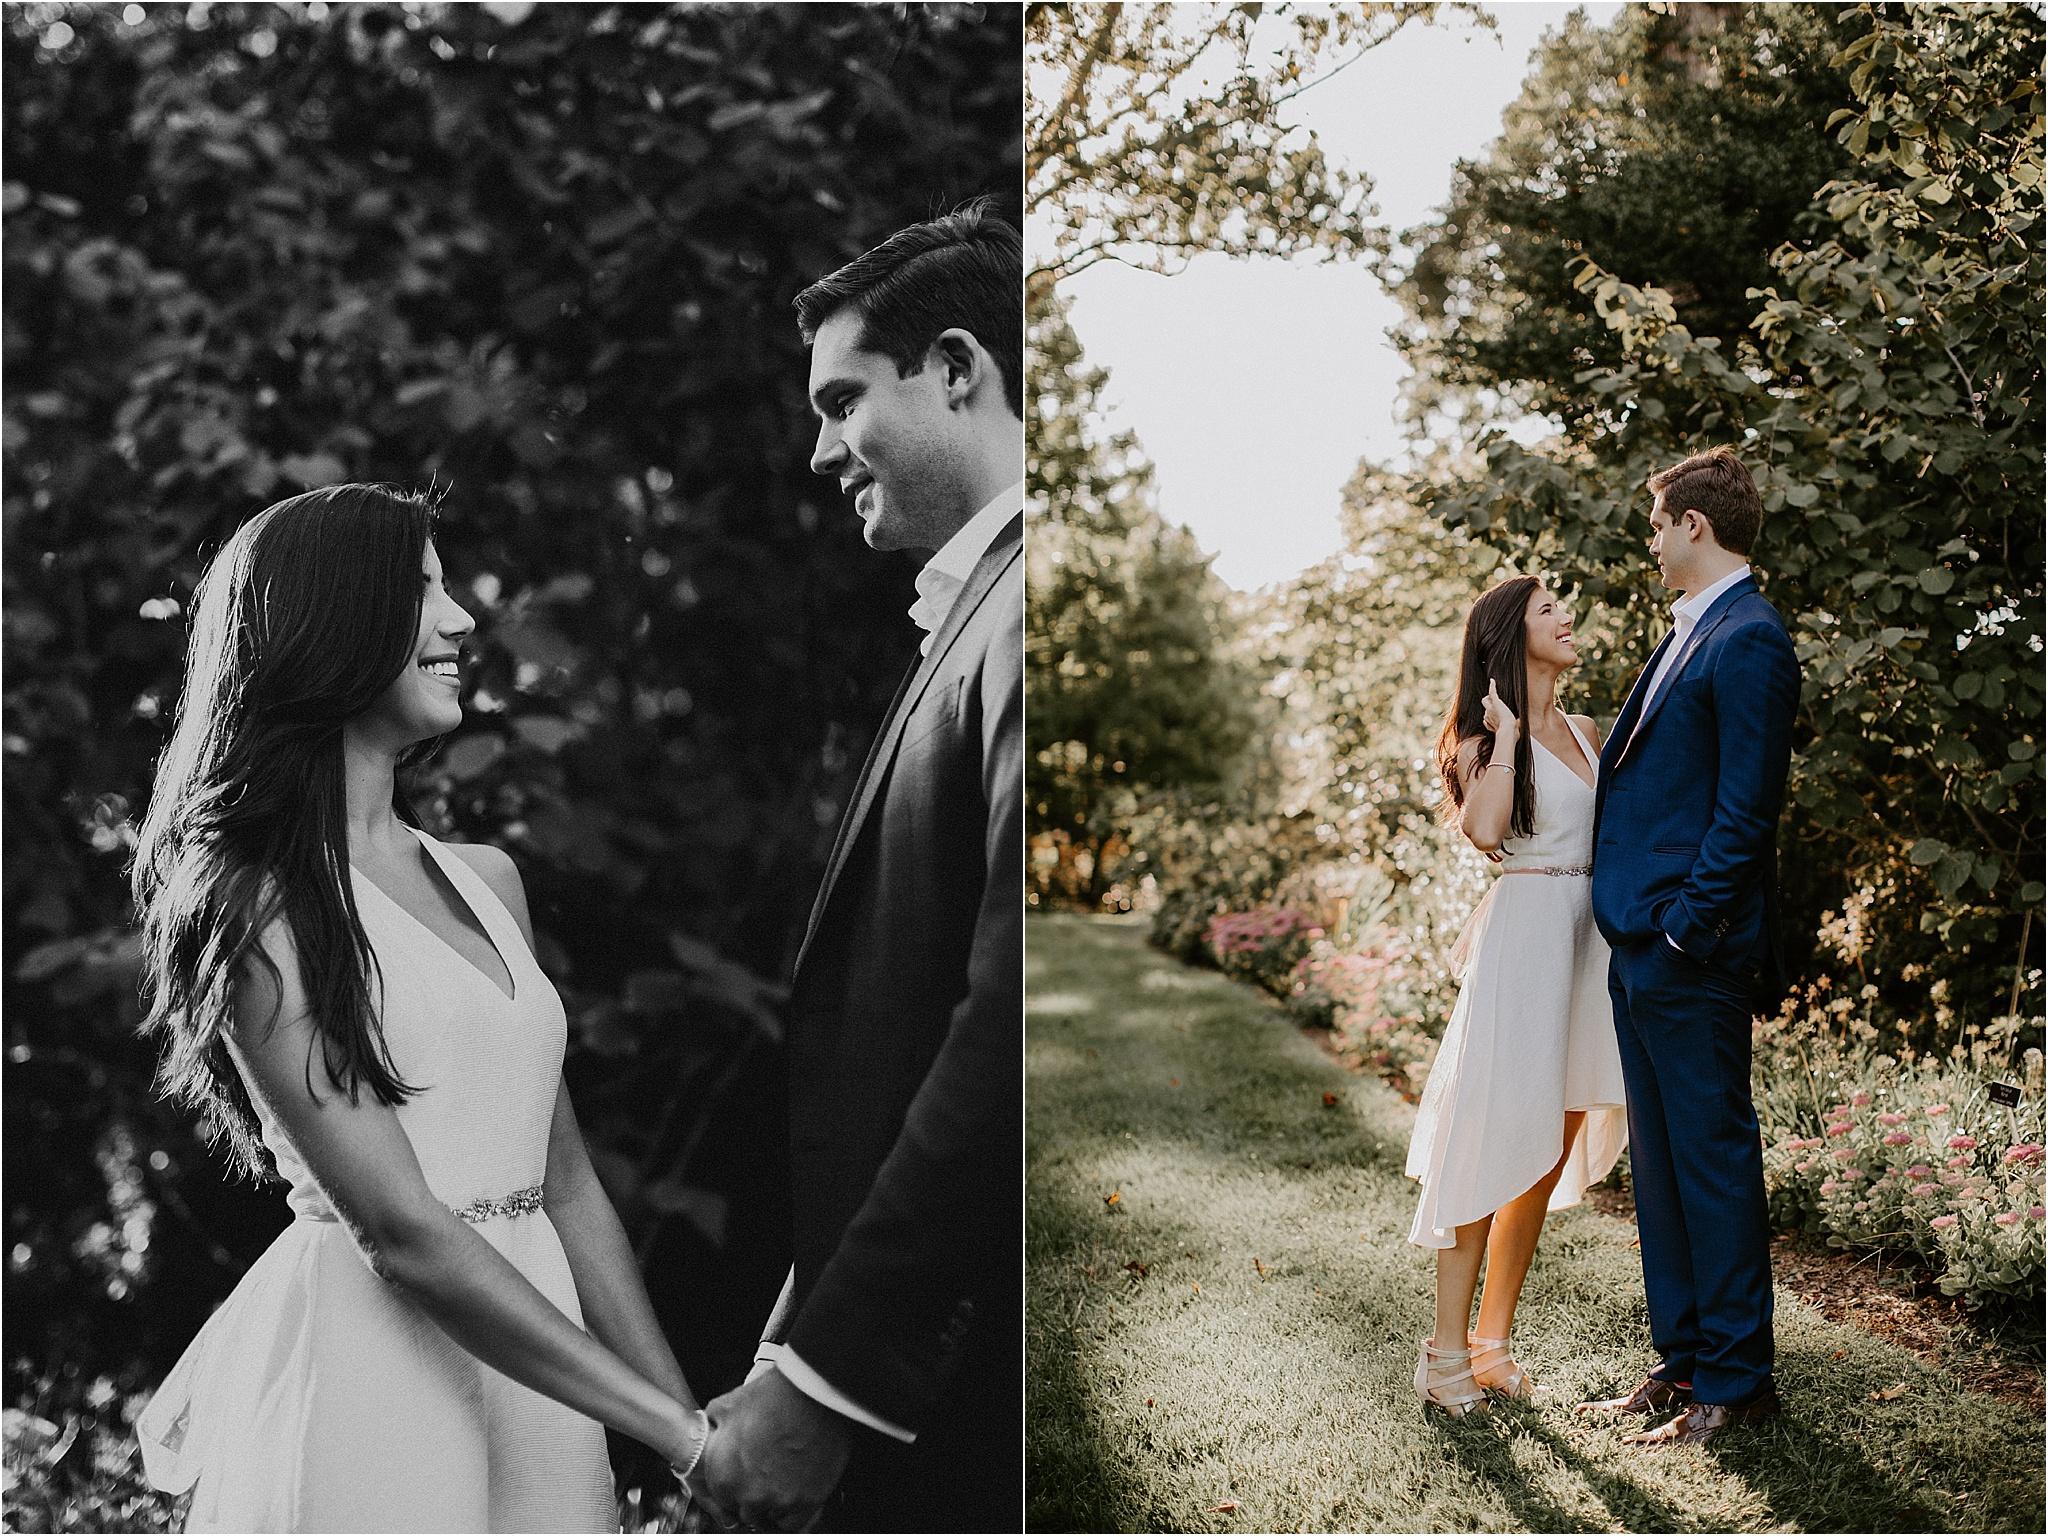 Sarah_Brookhart_Baltimore_Wedding_Photographer_0007.jpg